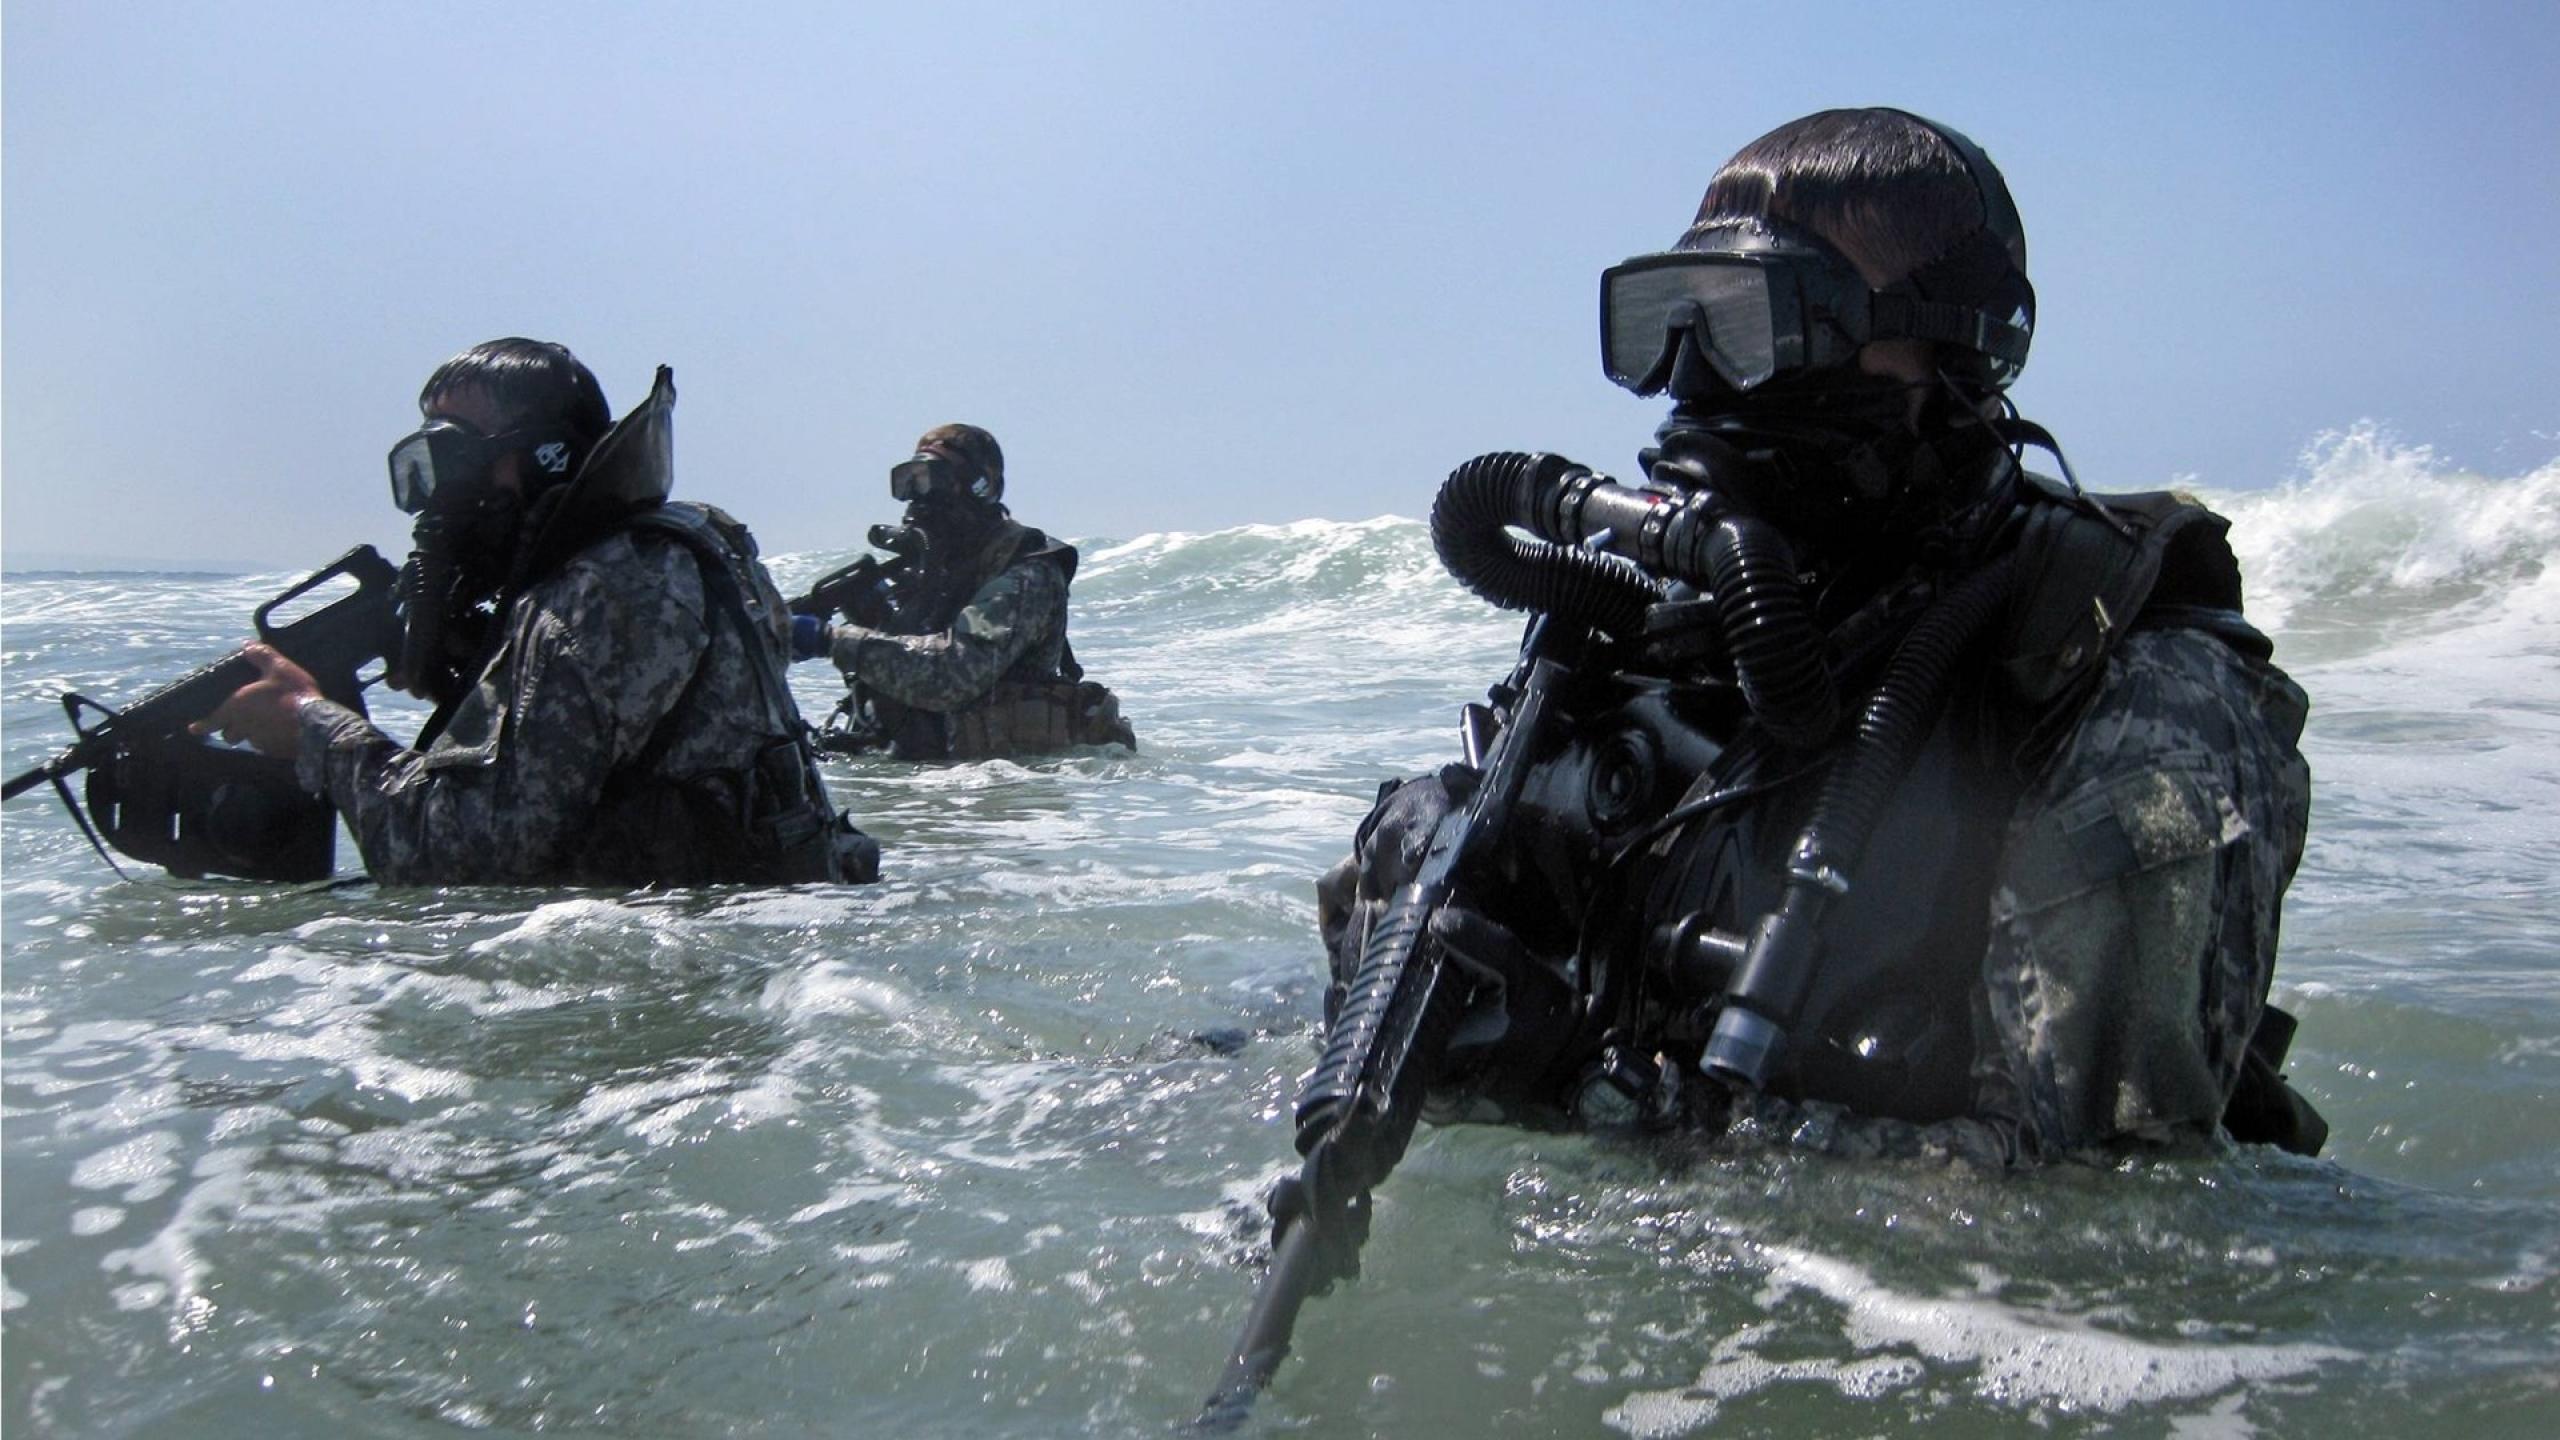 Navy Seals Wallpaper for Download 2560x1440